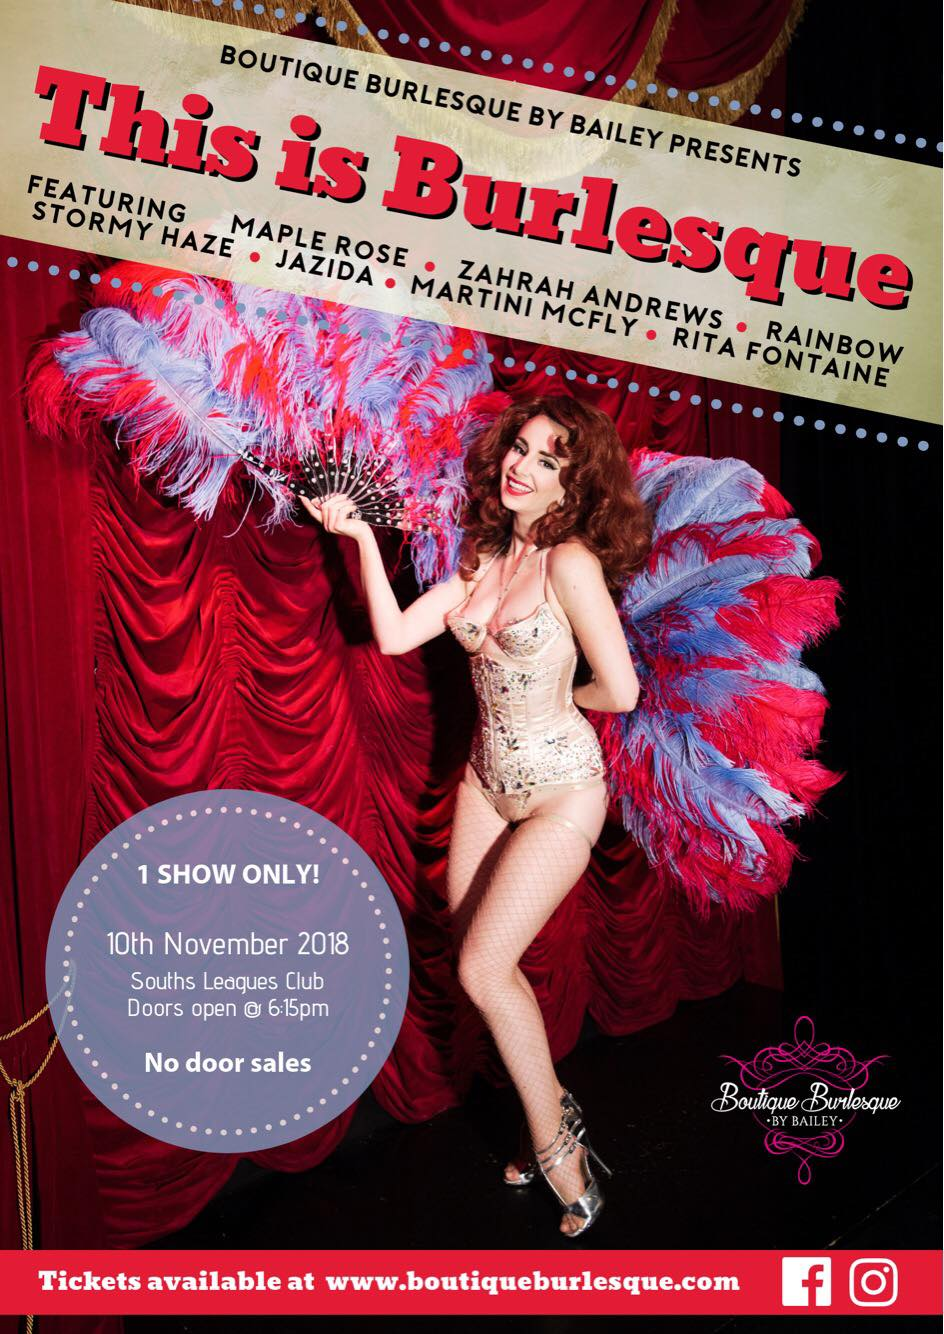 boutique burlesque poster.jpg